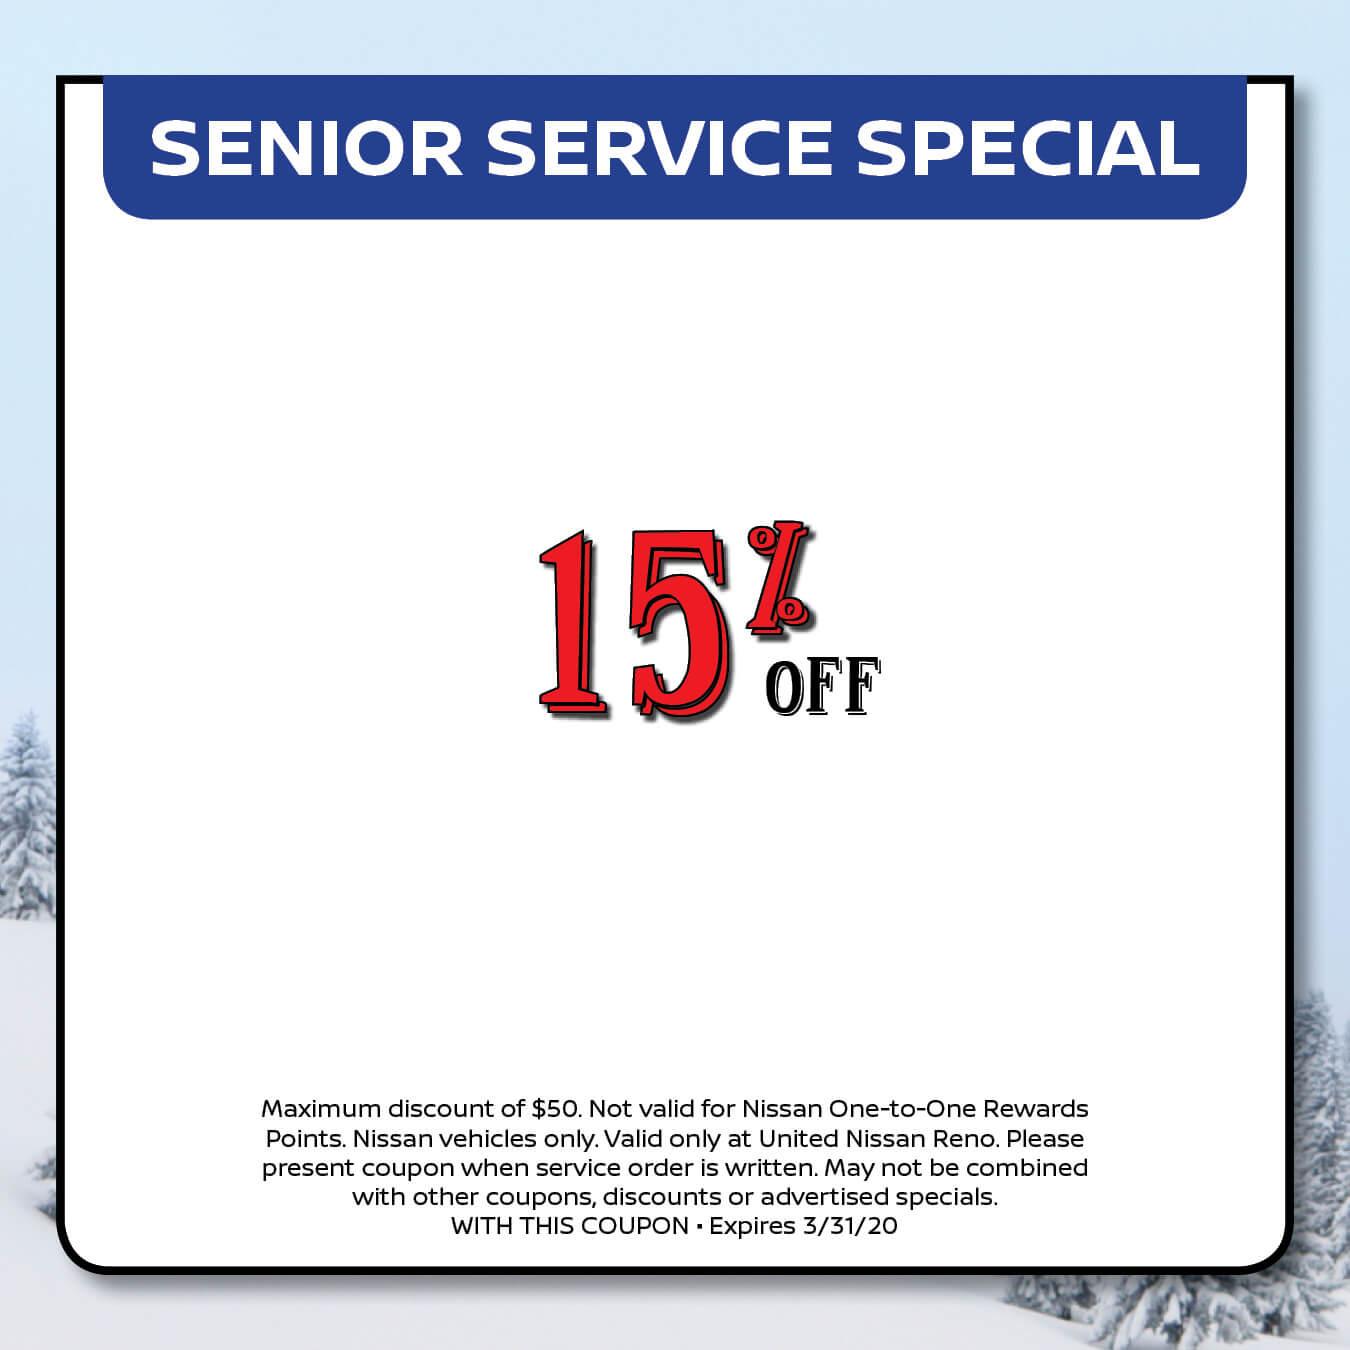 Senior Service Special